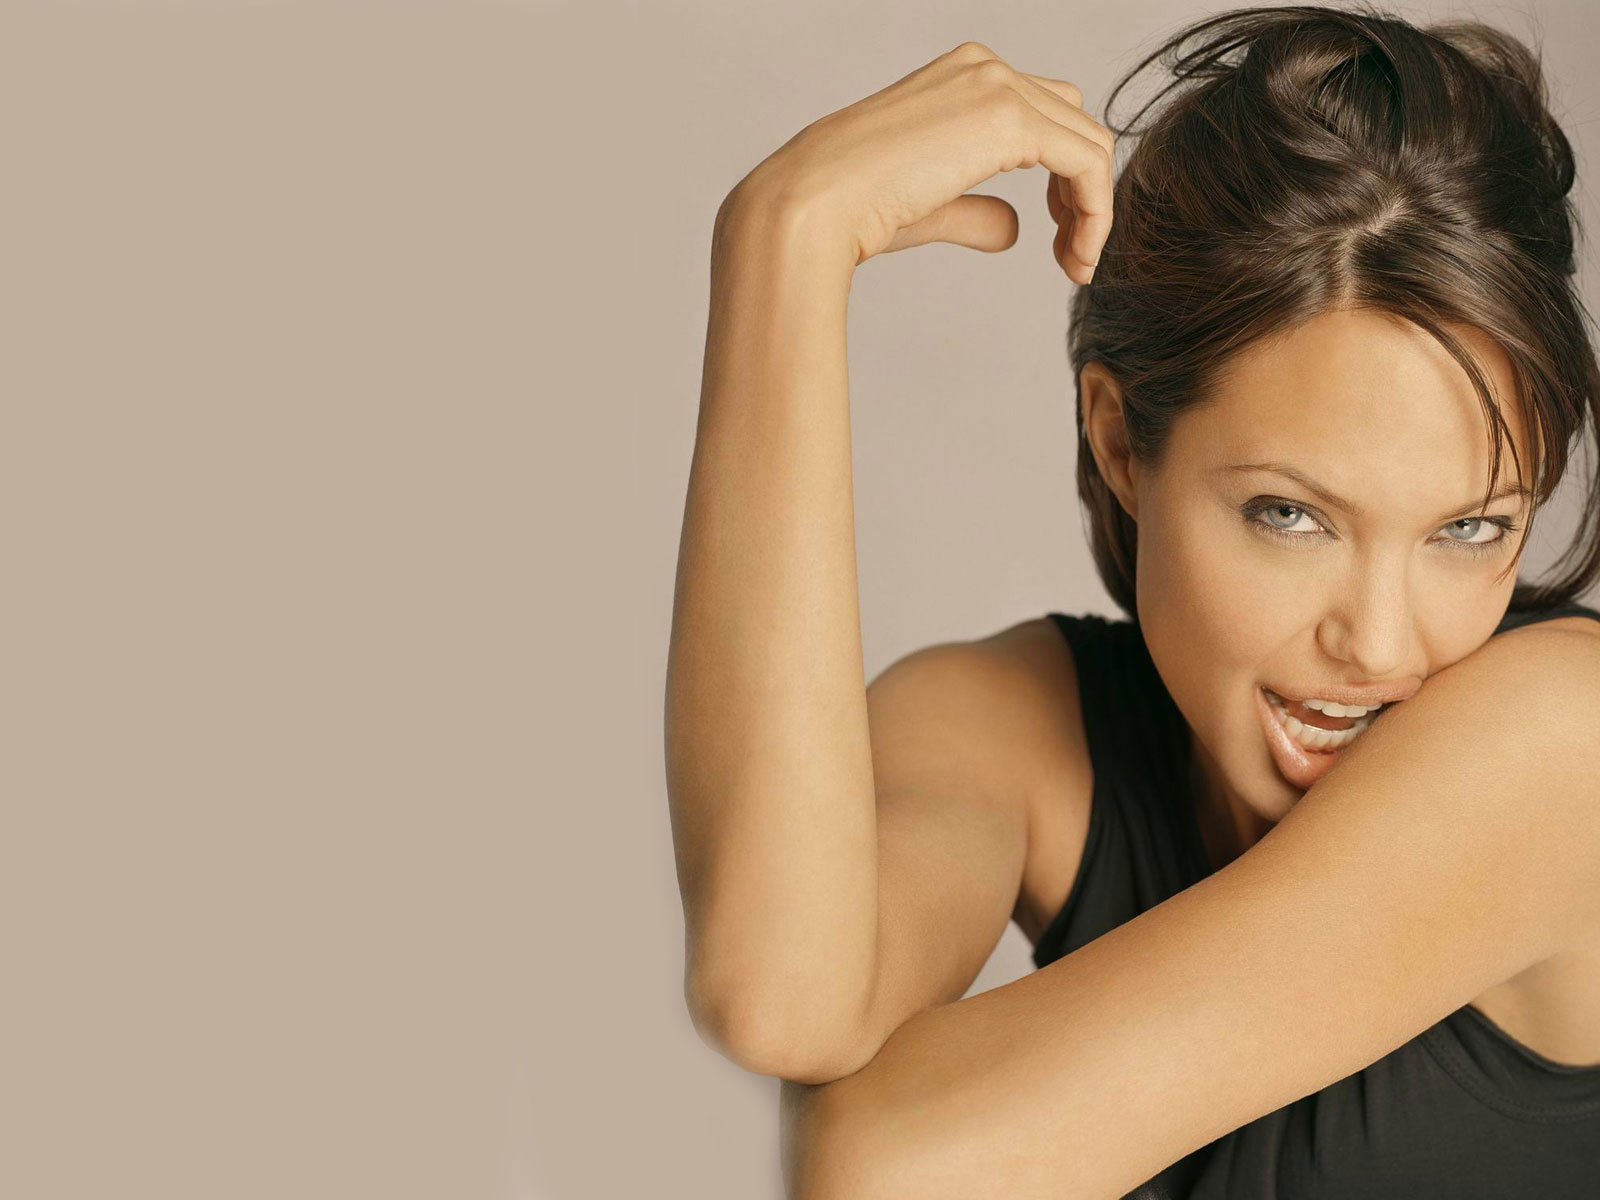 http://1.bp.blogspot.com/_JU_j7jj5TjU/TMmmE28F4qI/AAAAAAAAALM/FGbuRyLRxPw/s1600/Angelina-Jolie_20_6_.jpg